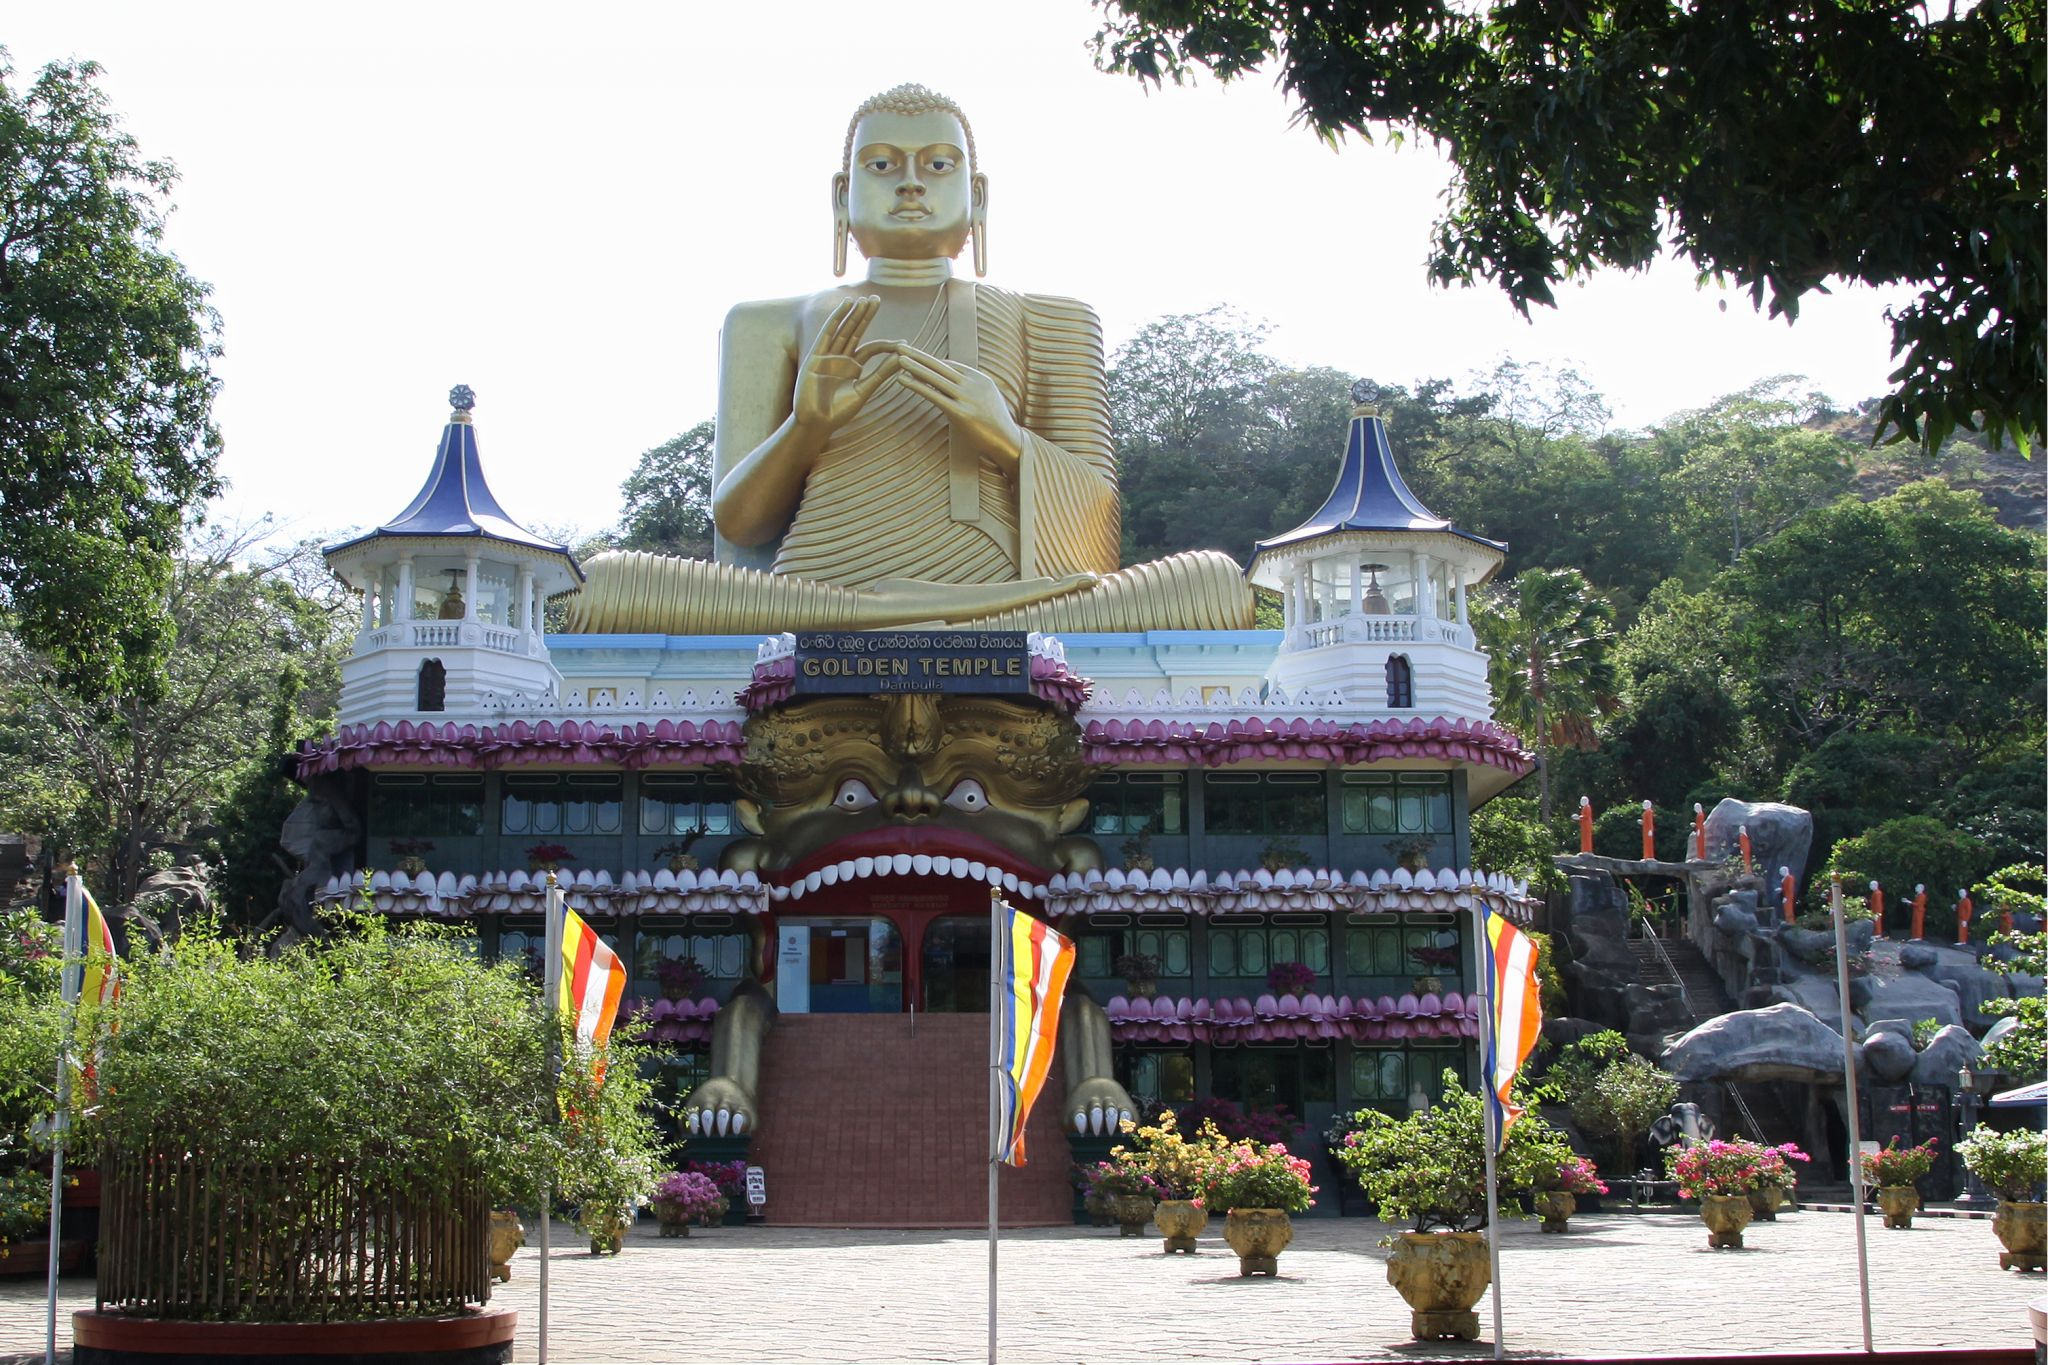 Dambulla Rajamaha Viharaya (Golden Temple), Sri Lanka